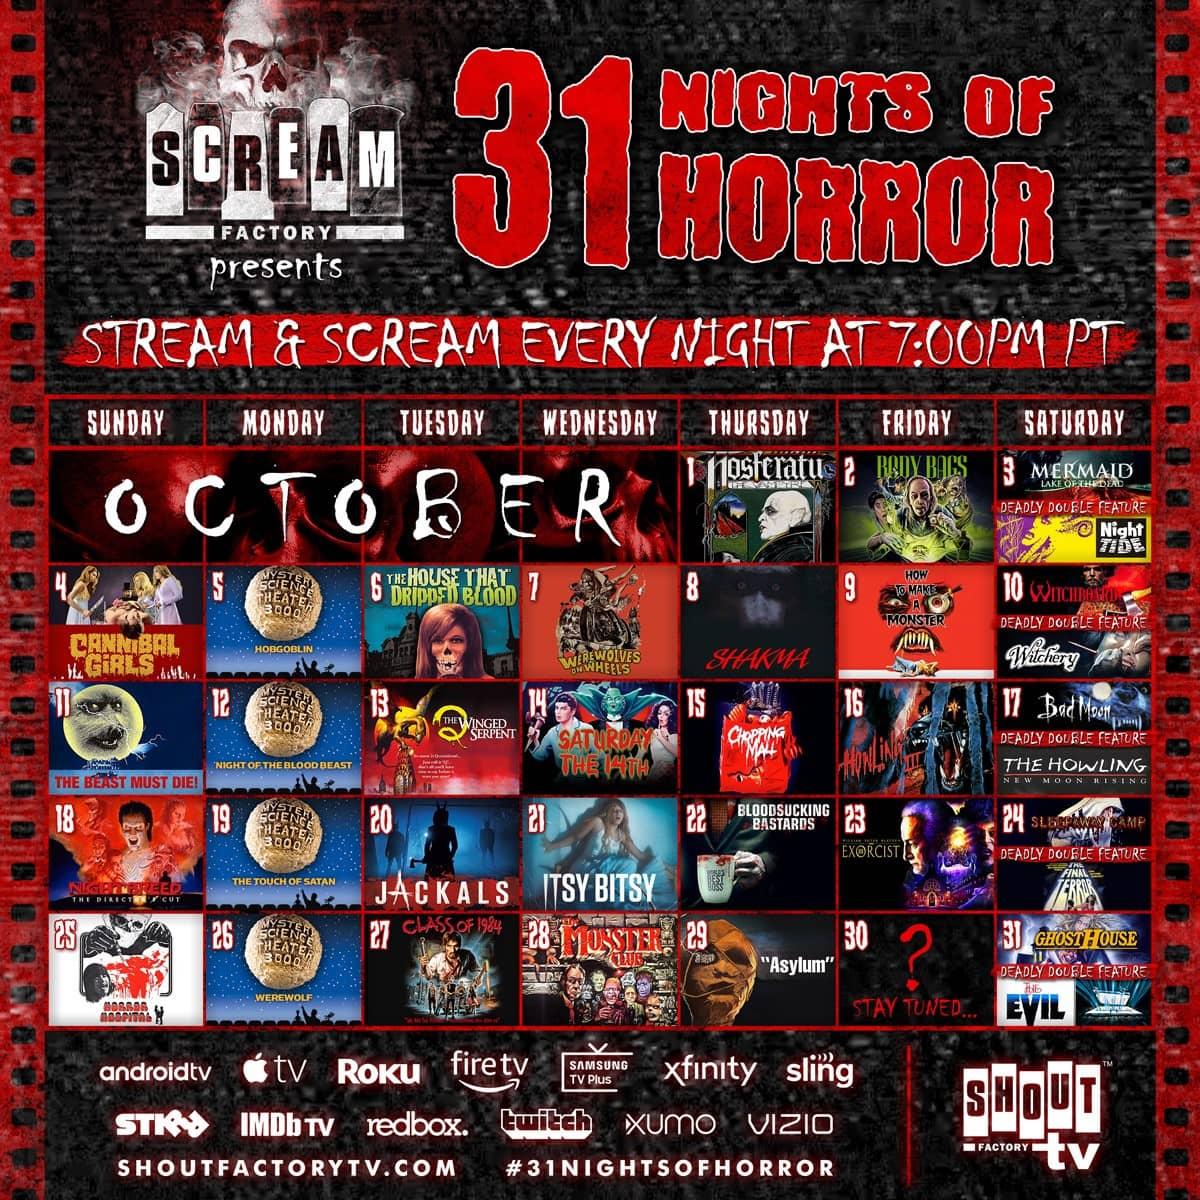 31 Nights Of Horror Scream Factory